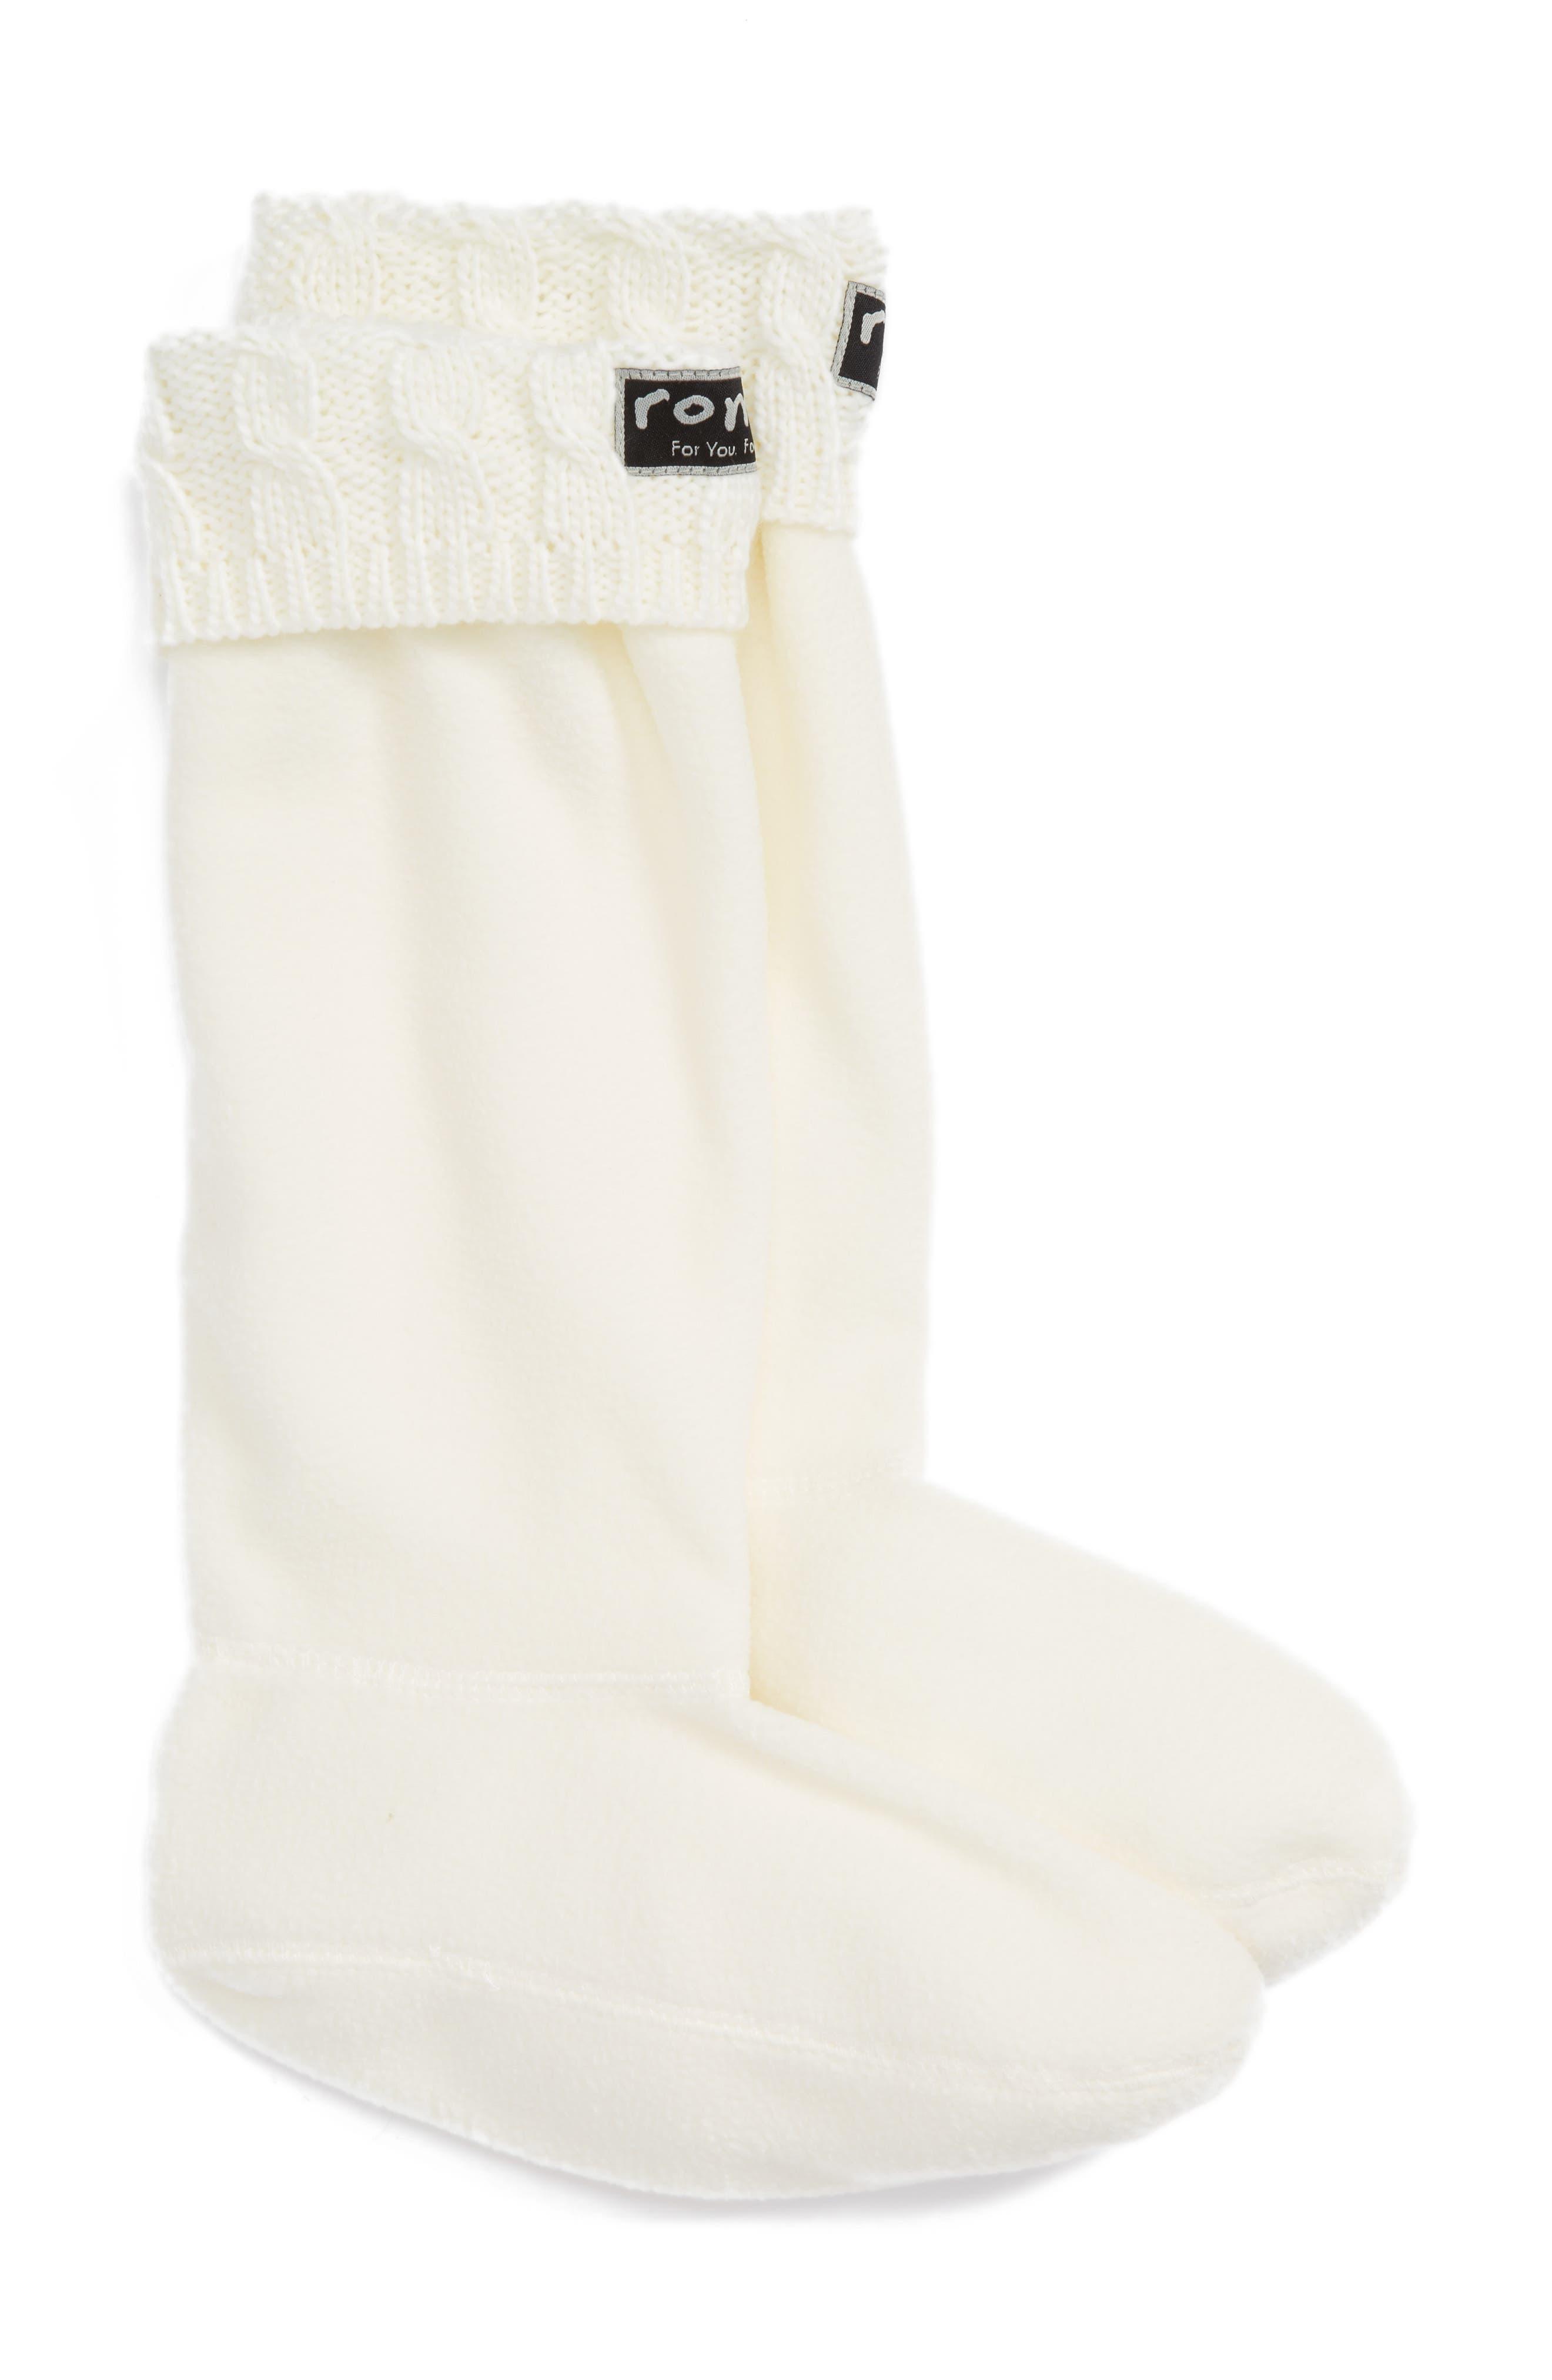 Knit Collar Fleece Boot Socks,                             Main thumbnail 1, color,                             Cream